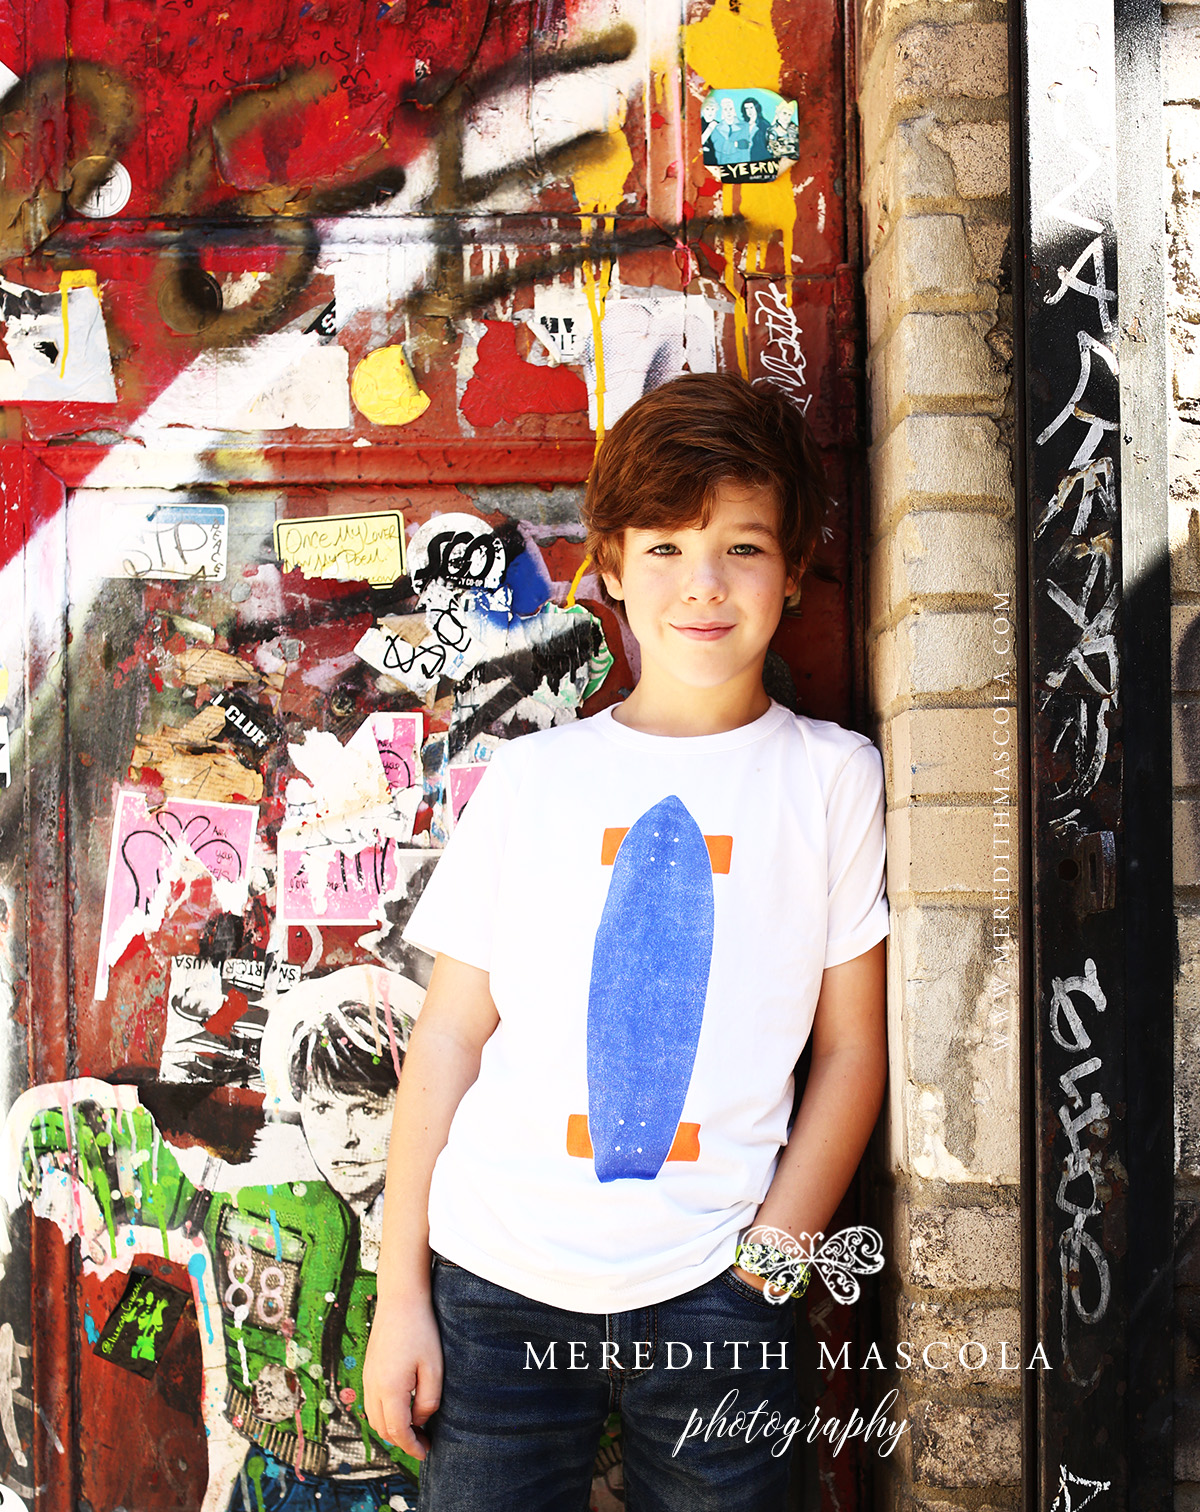 manhattanfamilyphotographer11.jpg